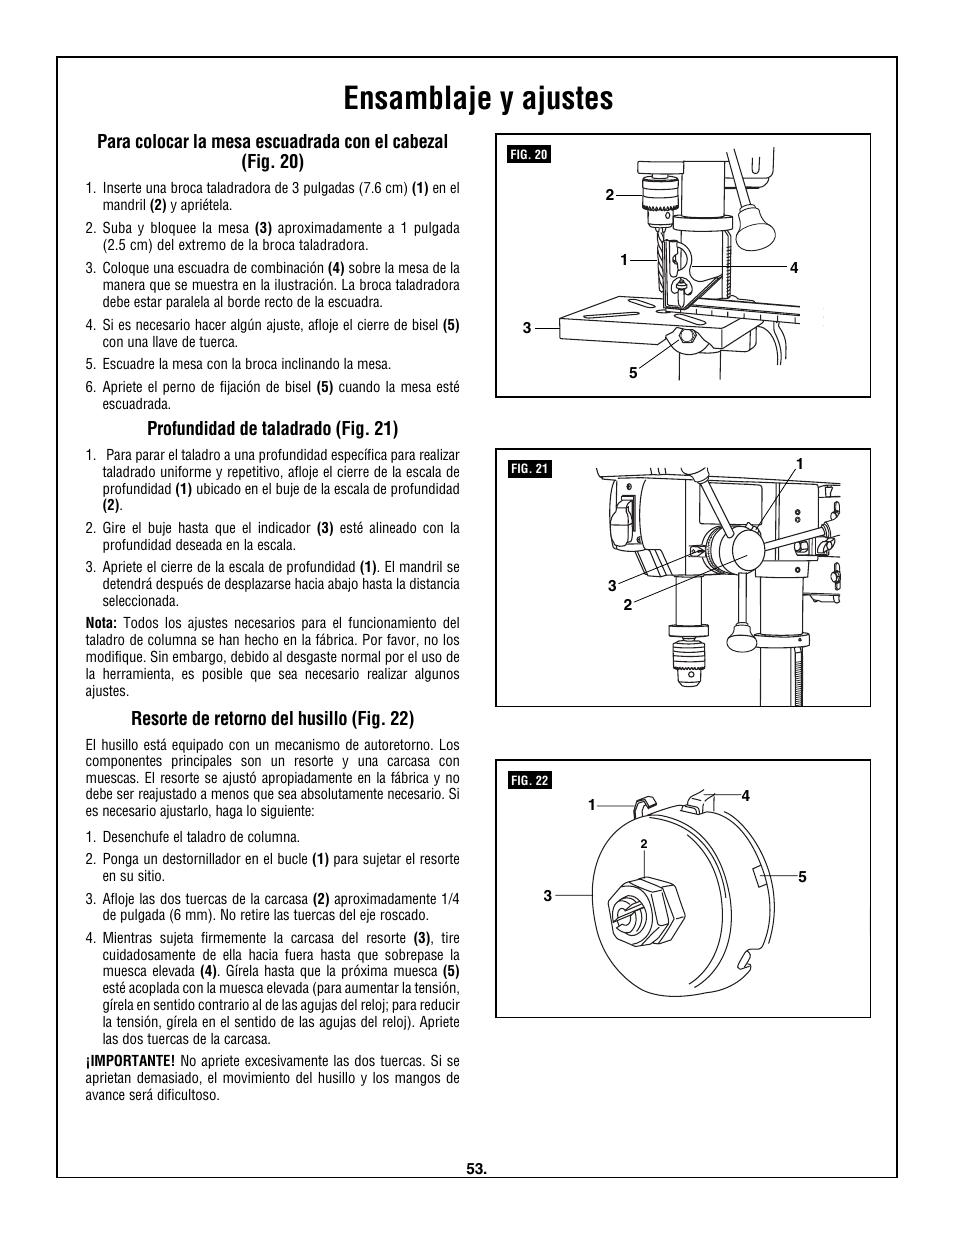 ensamblaje y ajustes skil 3320 01 user manual page 53 60 rh manualsdir com